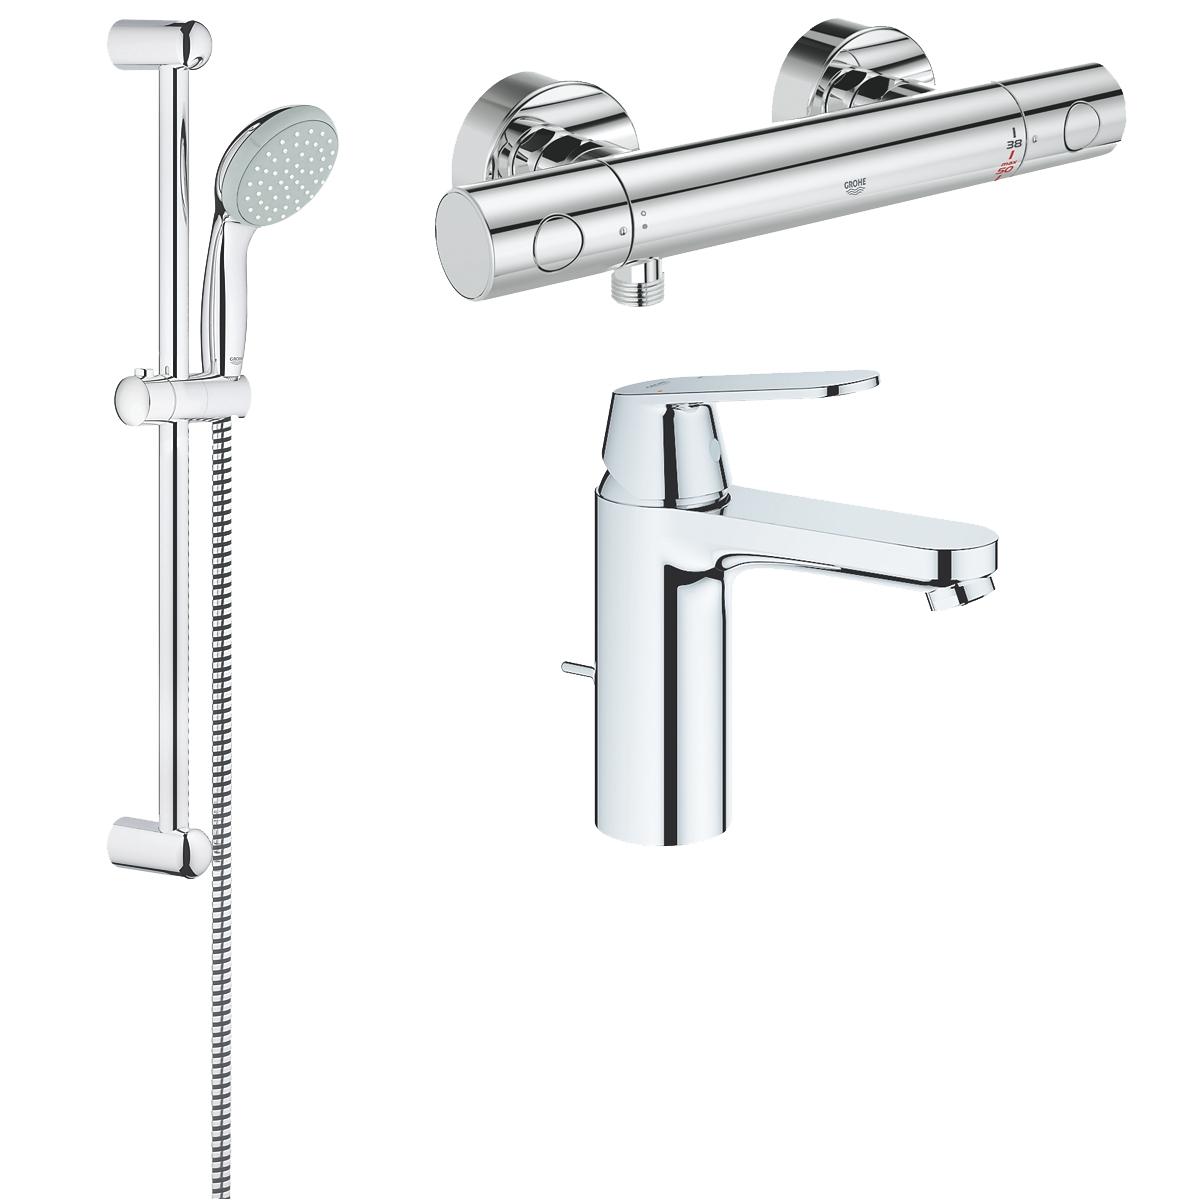 Lot spécial rénovation salle de bain Grohe